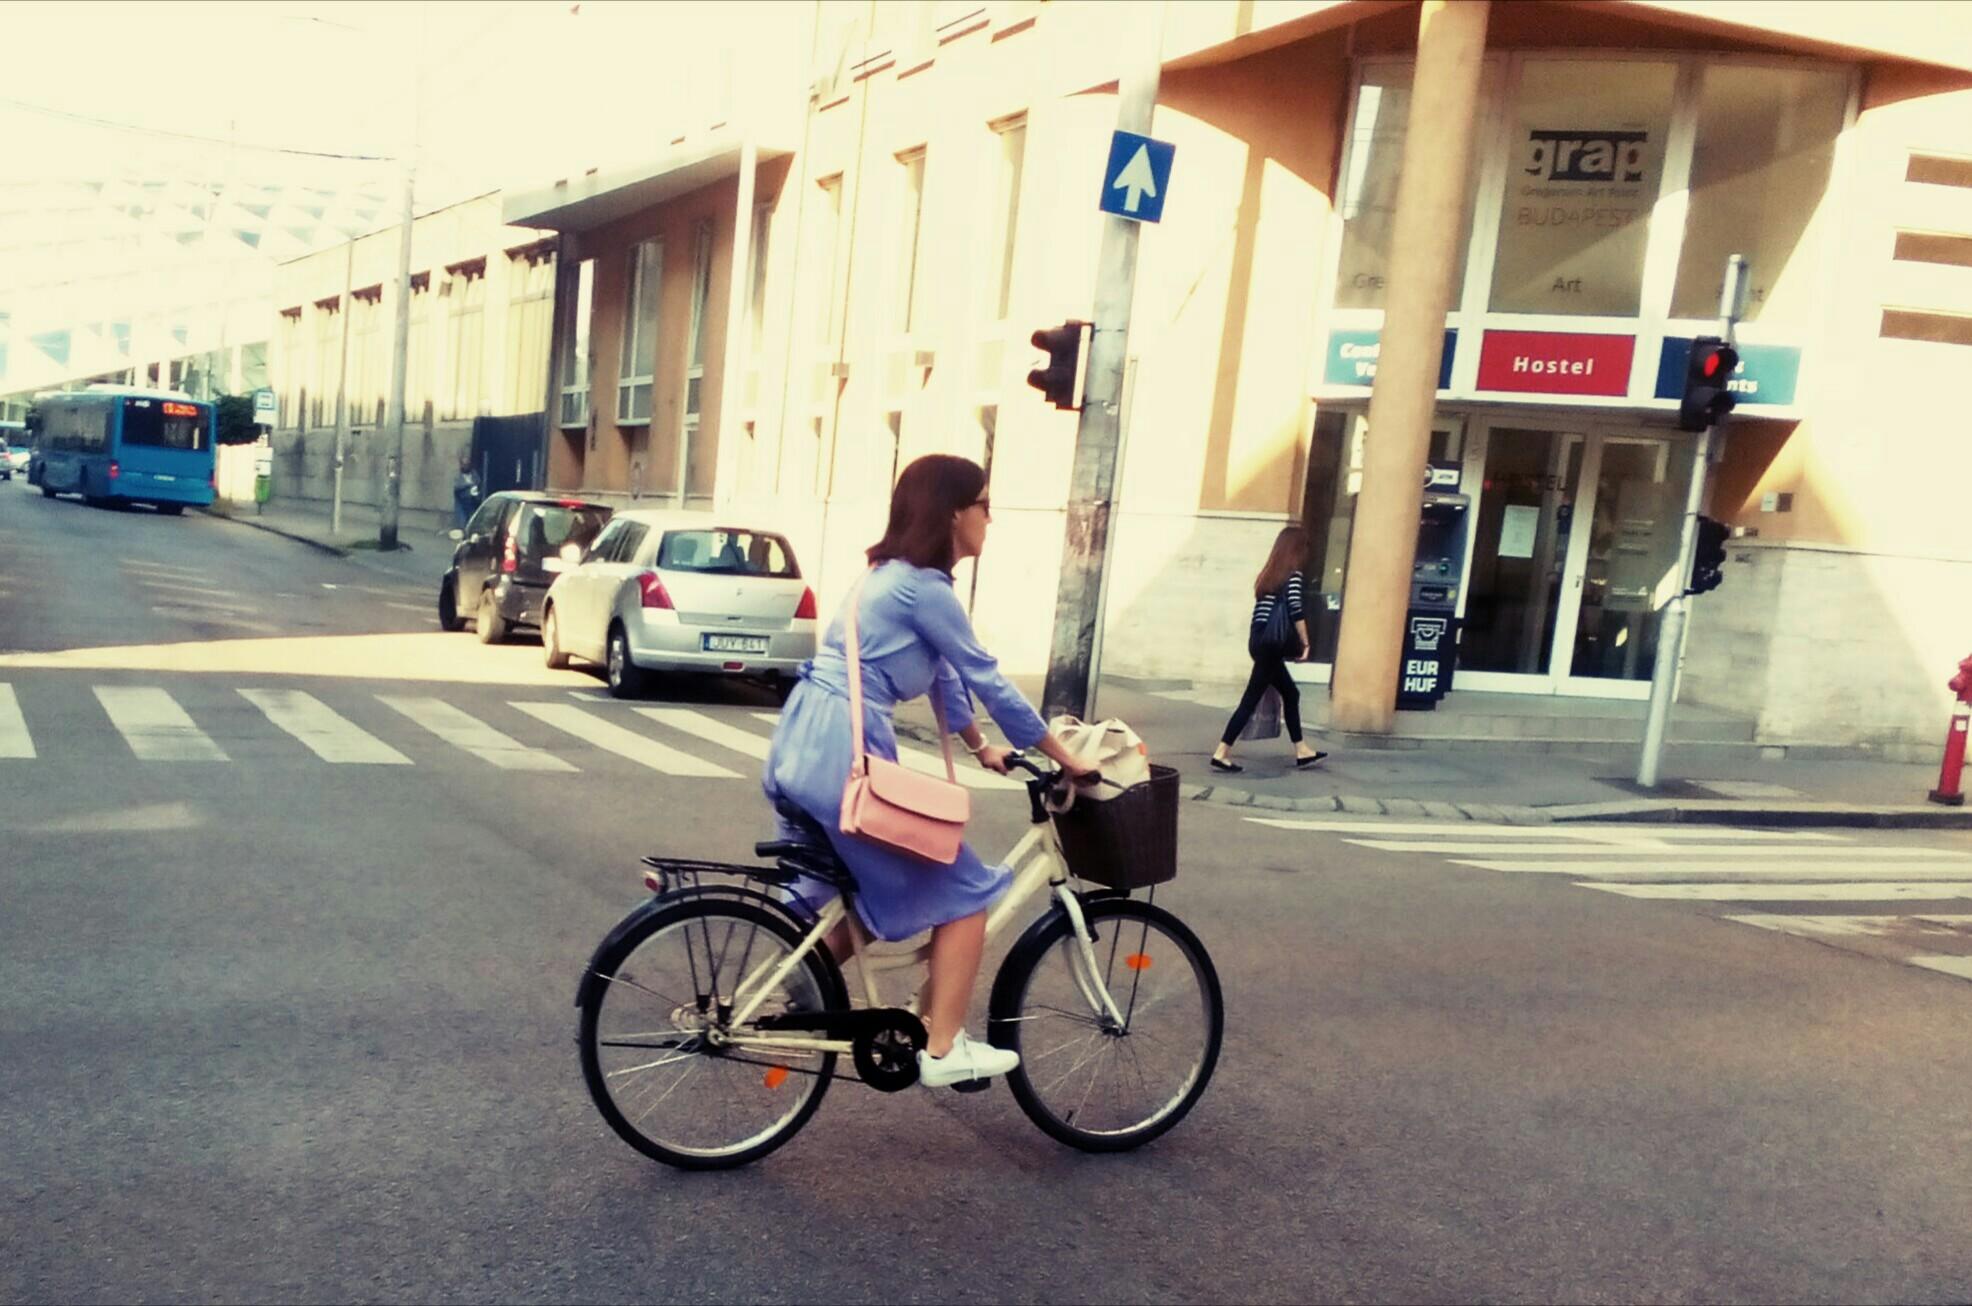 Lila dalra kel egy bicikli